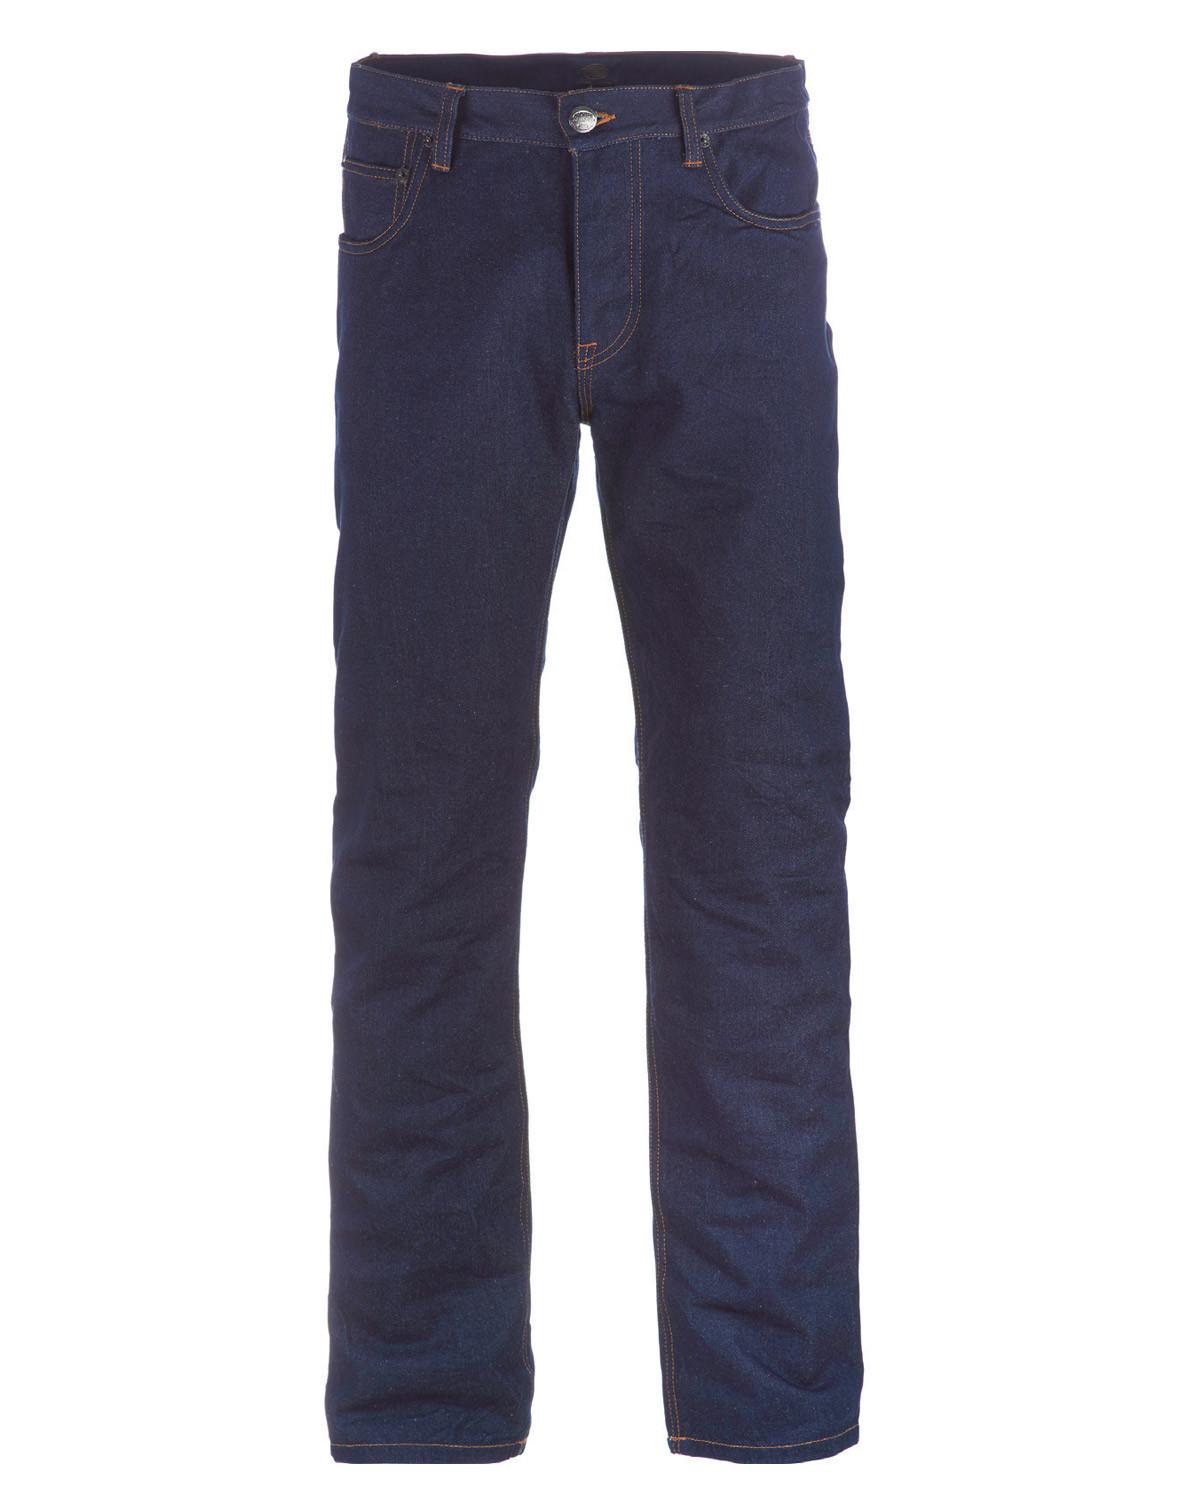 Image of   Dickies Denim jeans (Indigo, W32 / L34)